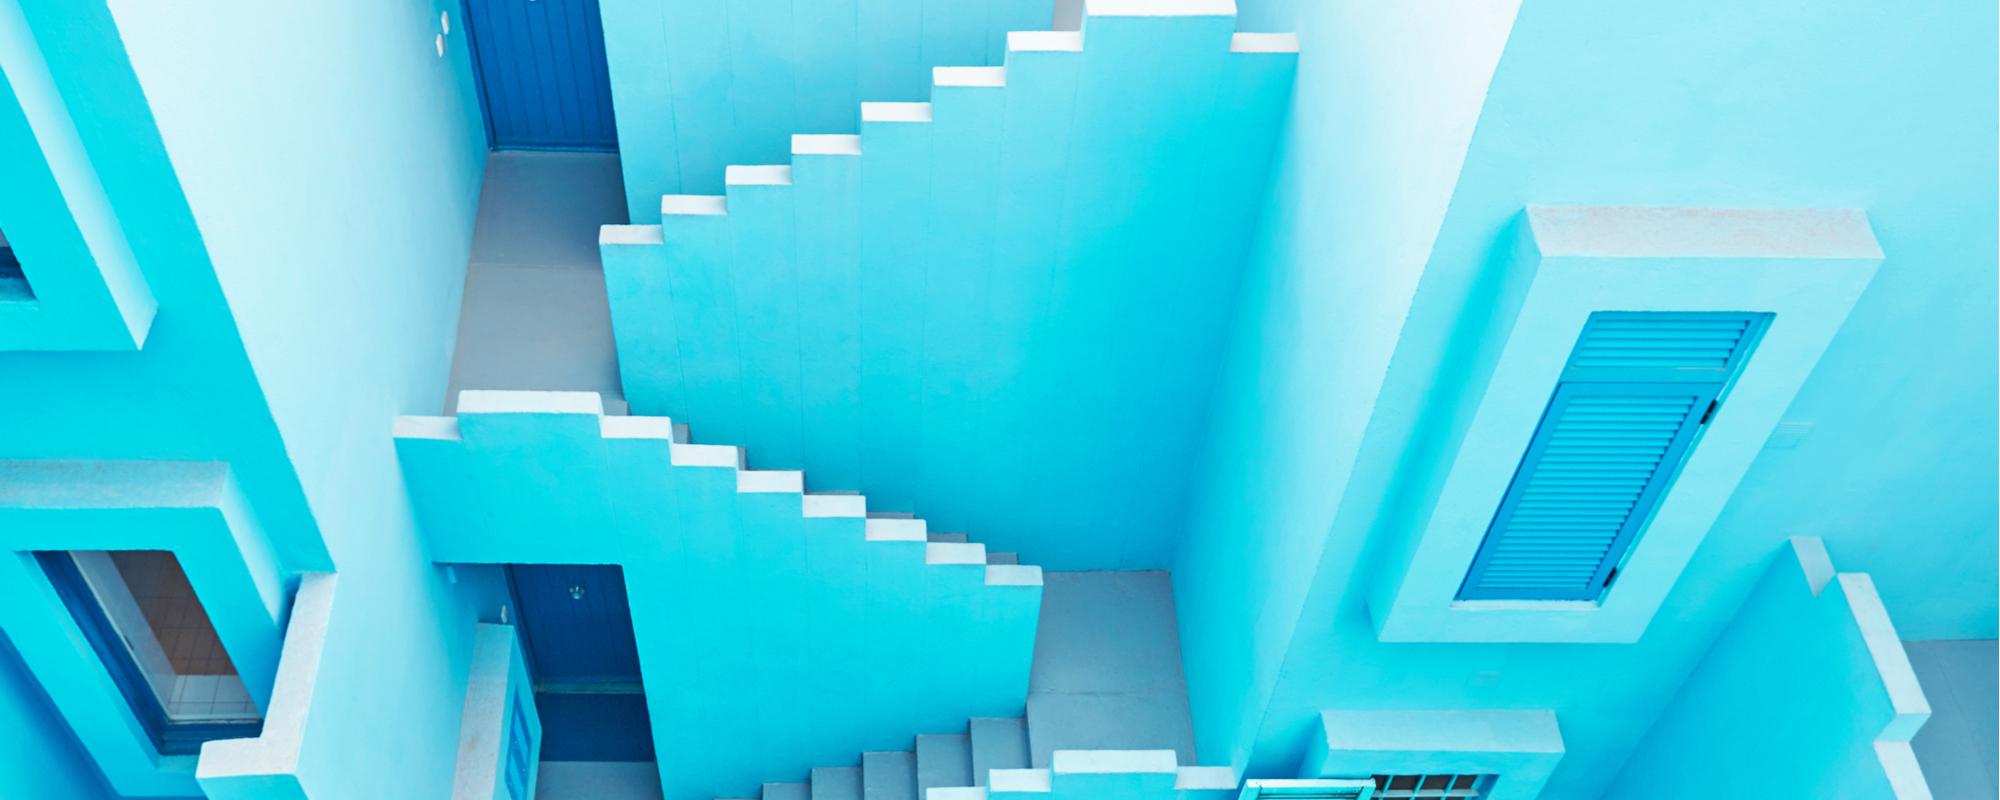 rentalz-stairs-1